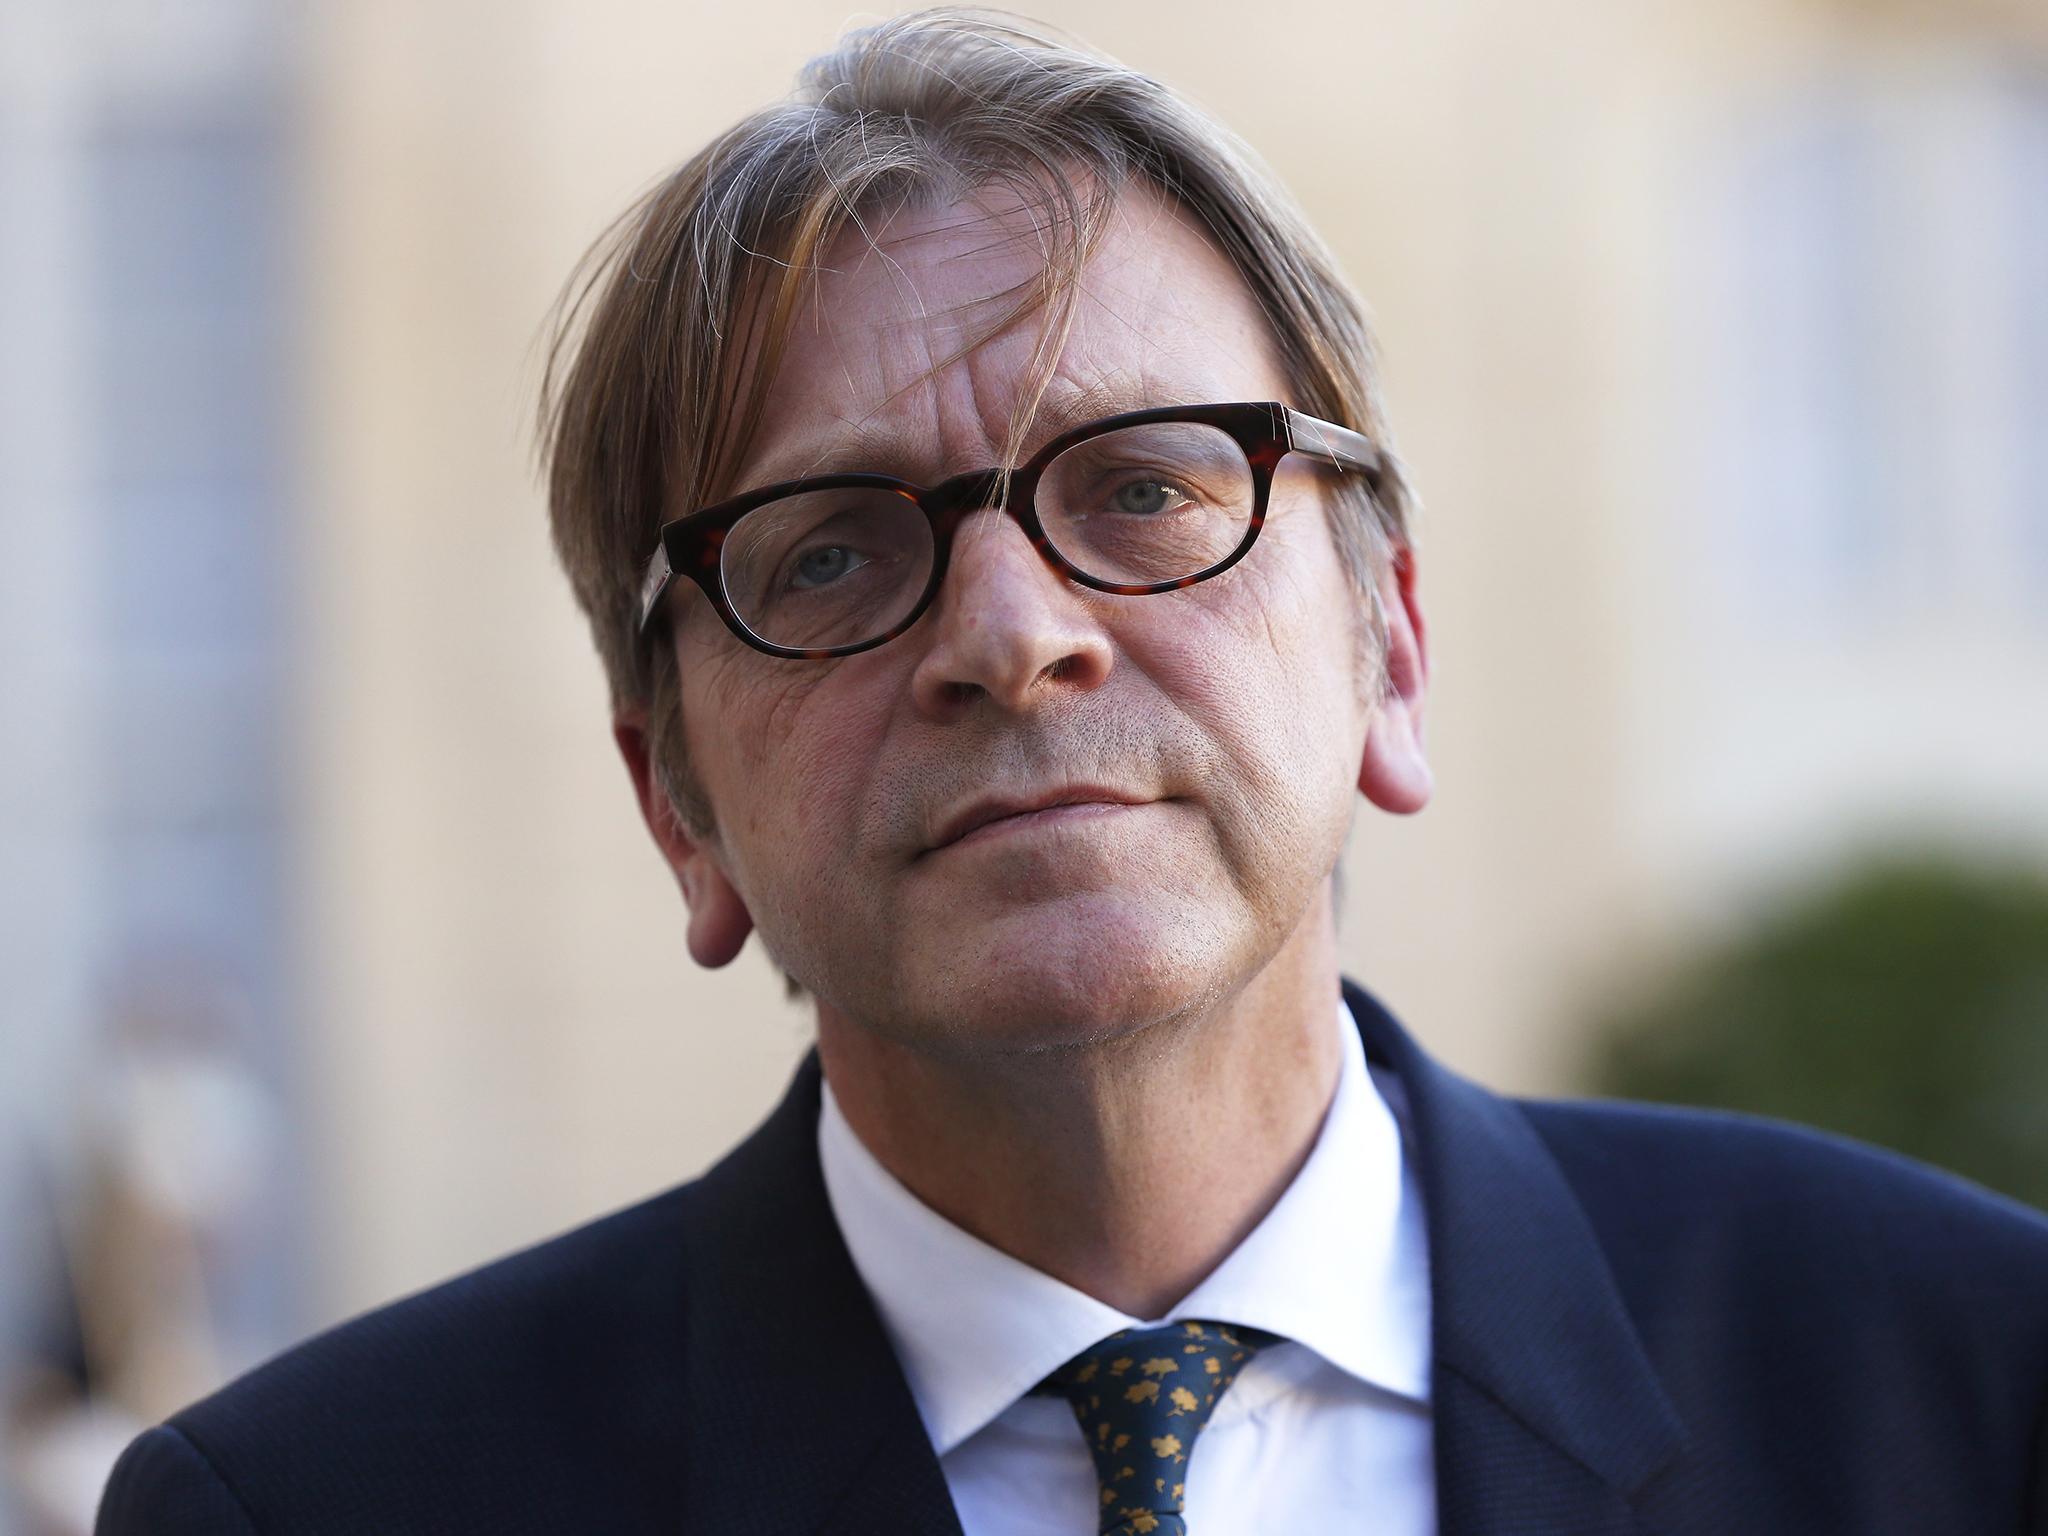 EU negotiators will offer Brits an individual opt-in to remain EU citizens, chief negotiator confirms